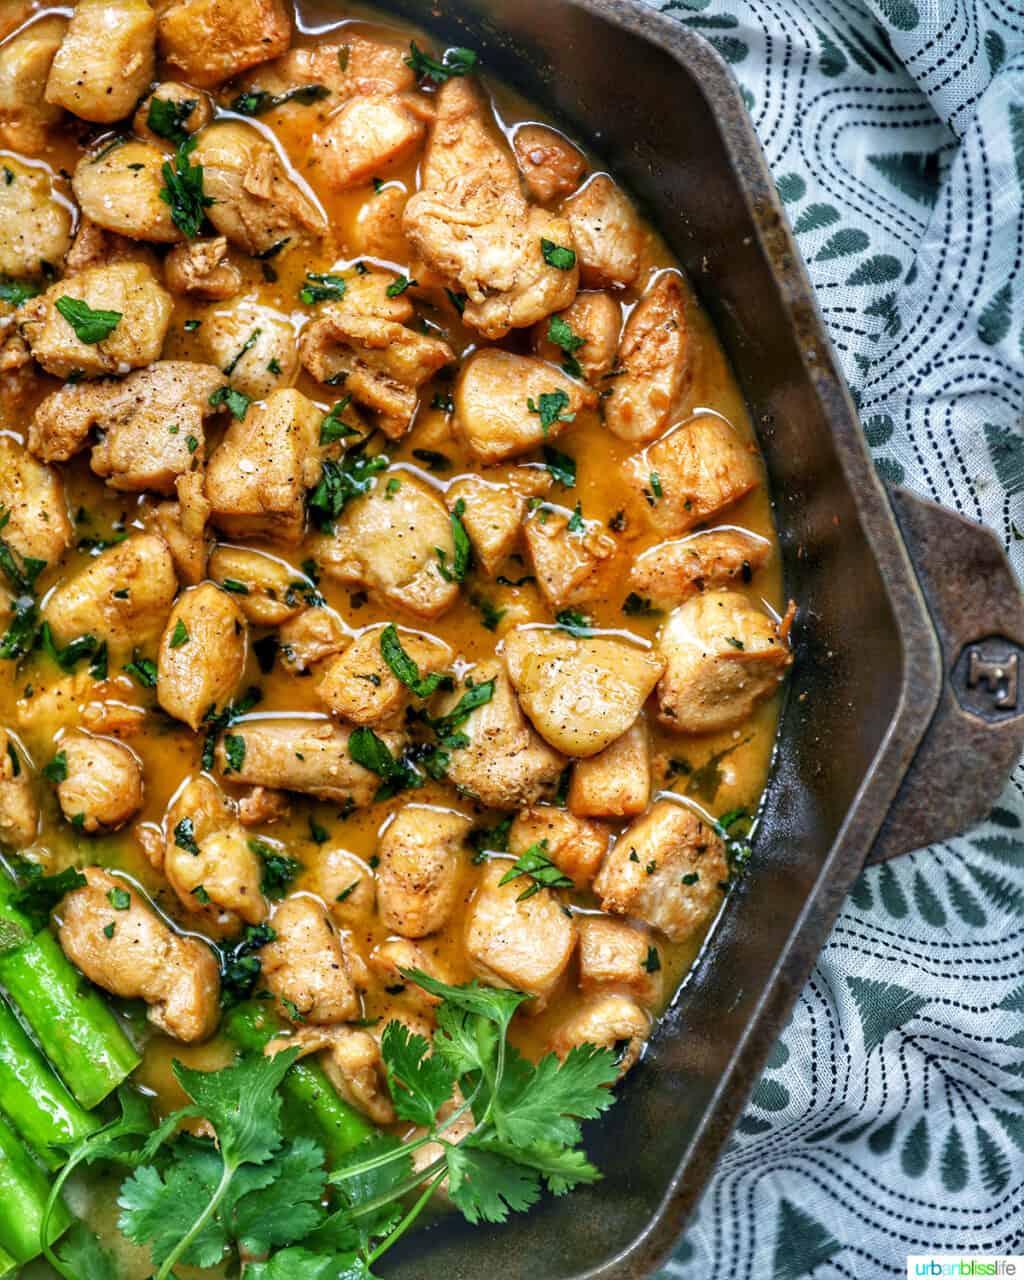 soy garlic butter chicken bites in cast iron pan